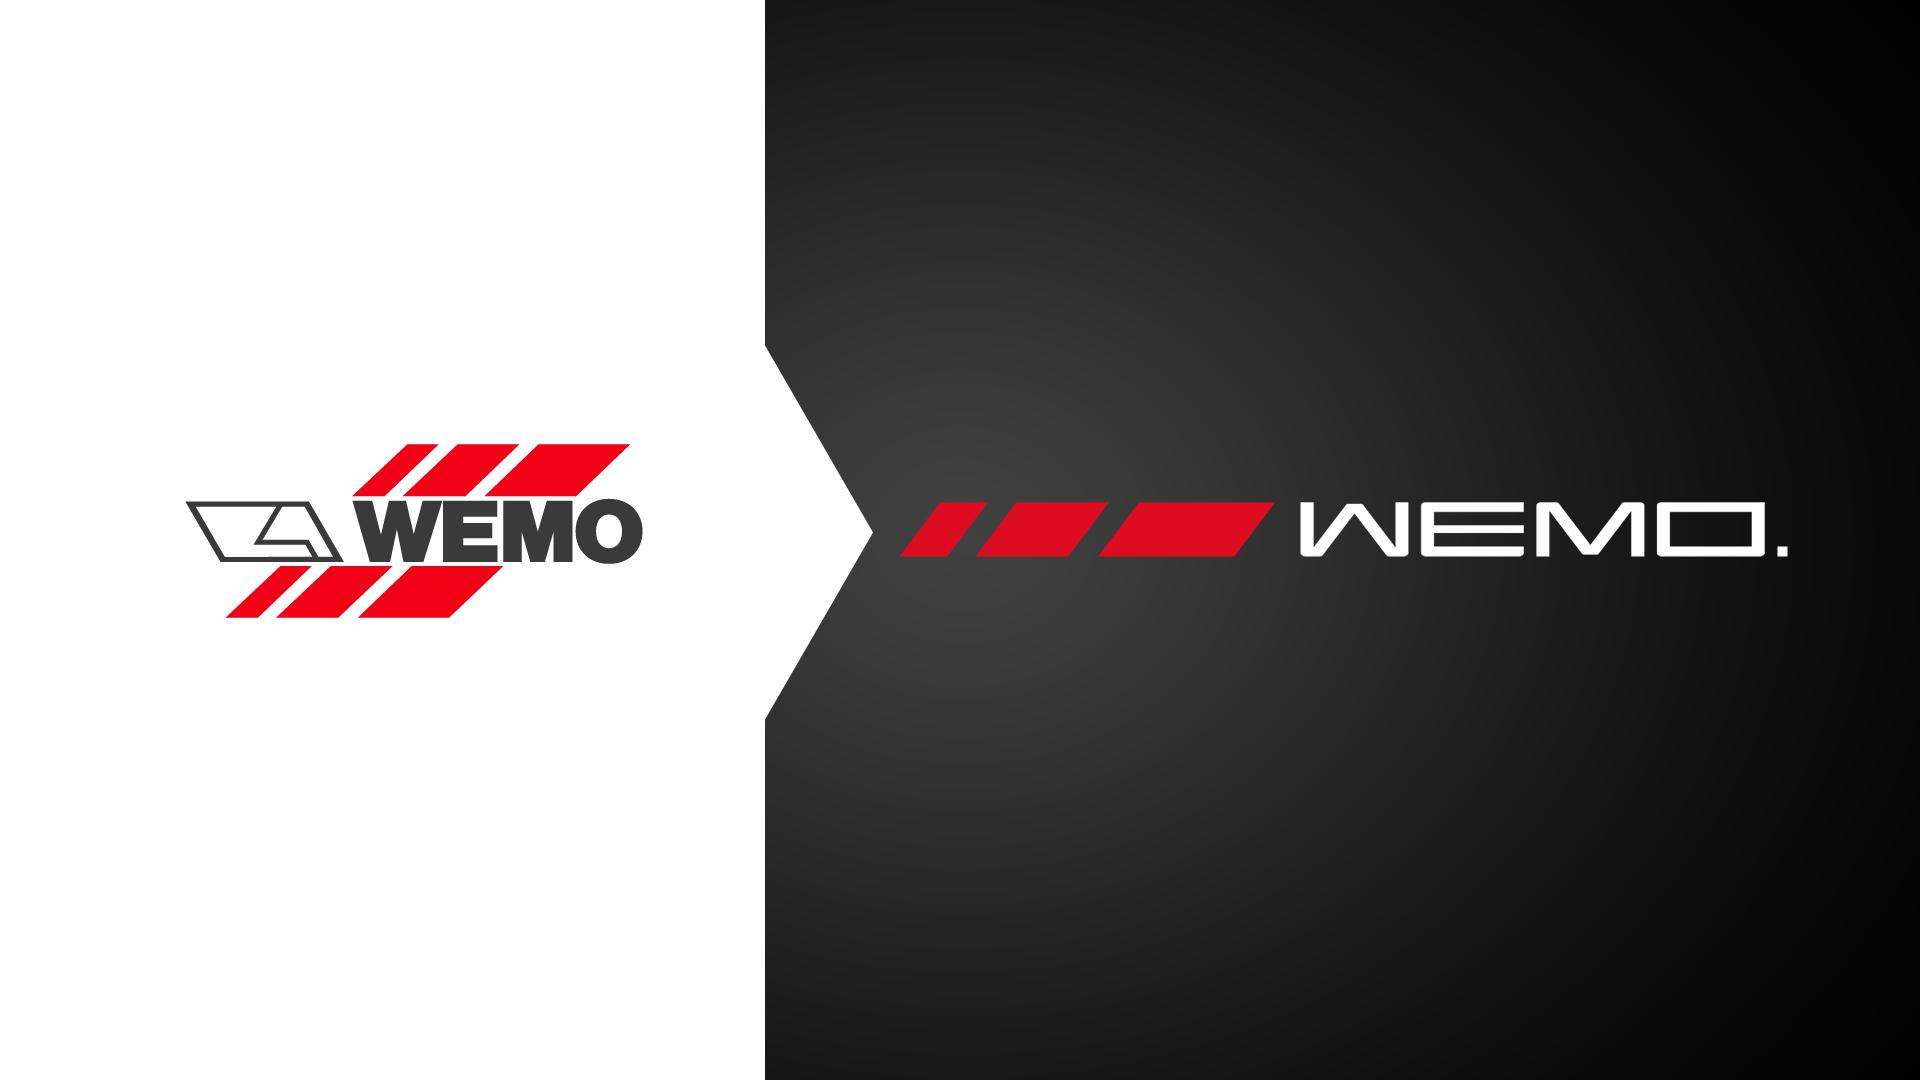 wemo_omprofilering.jpg